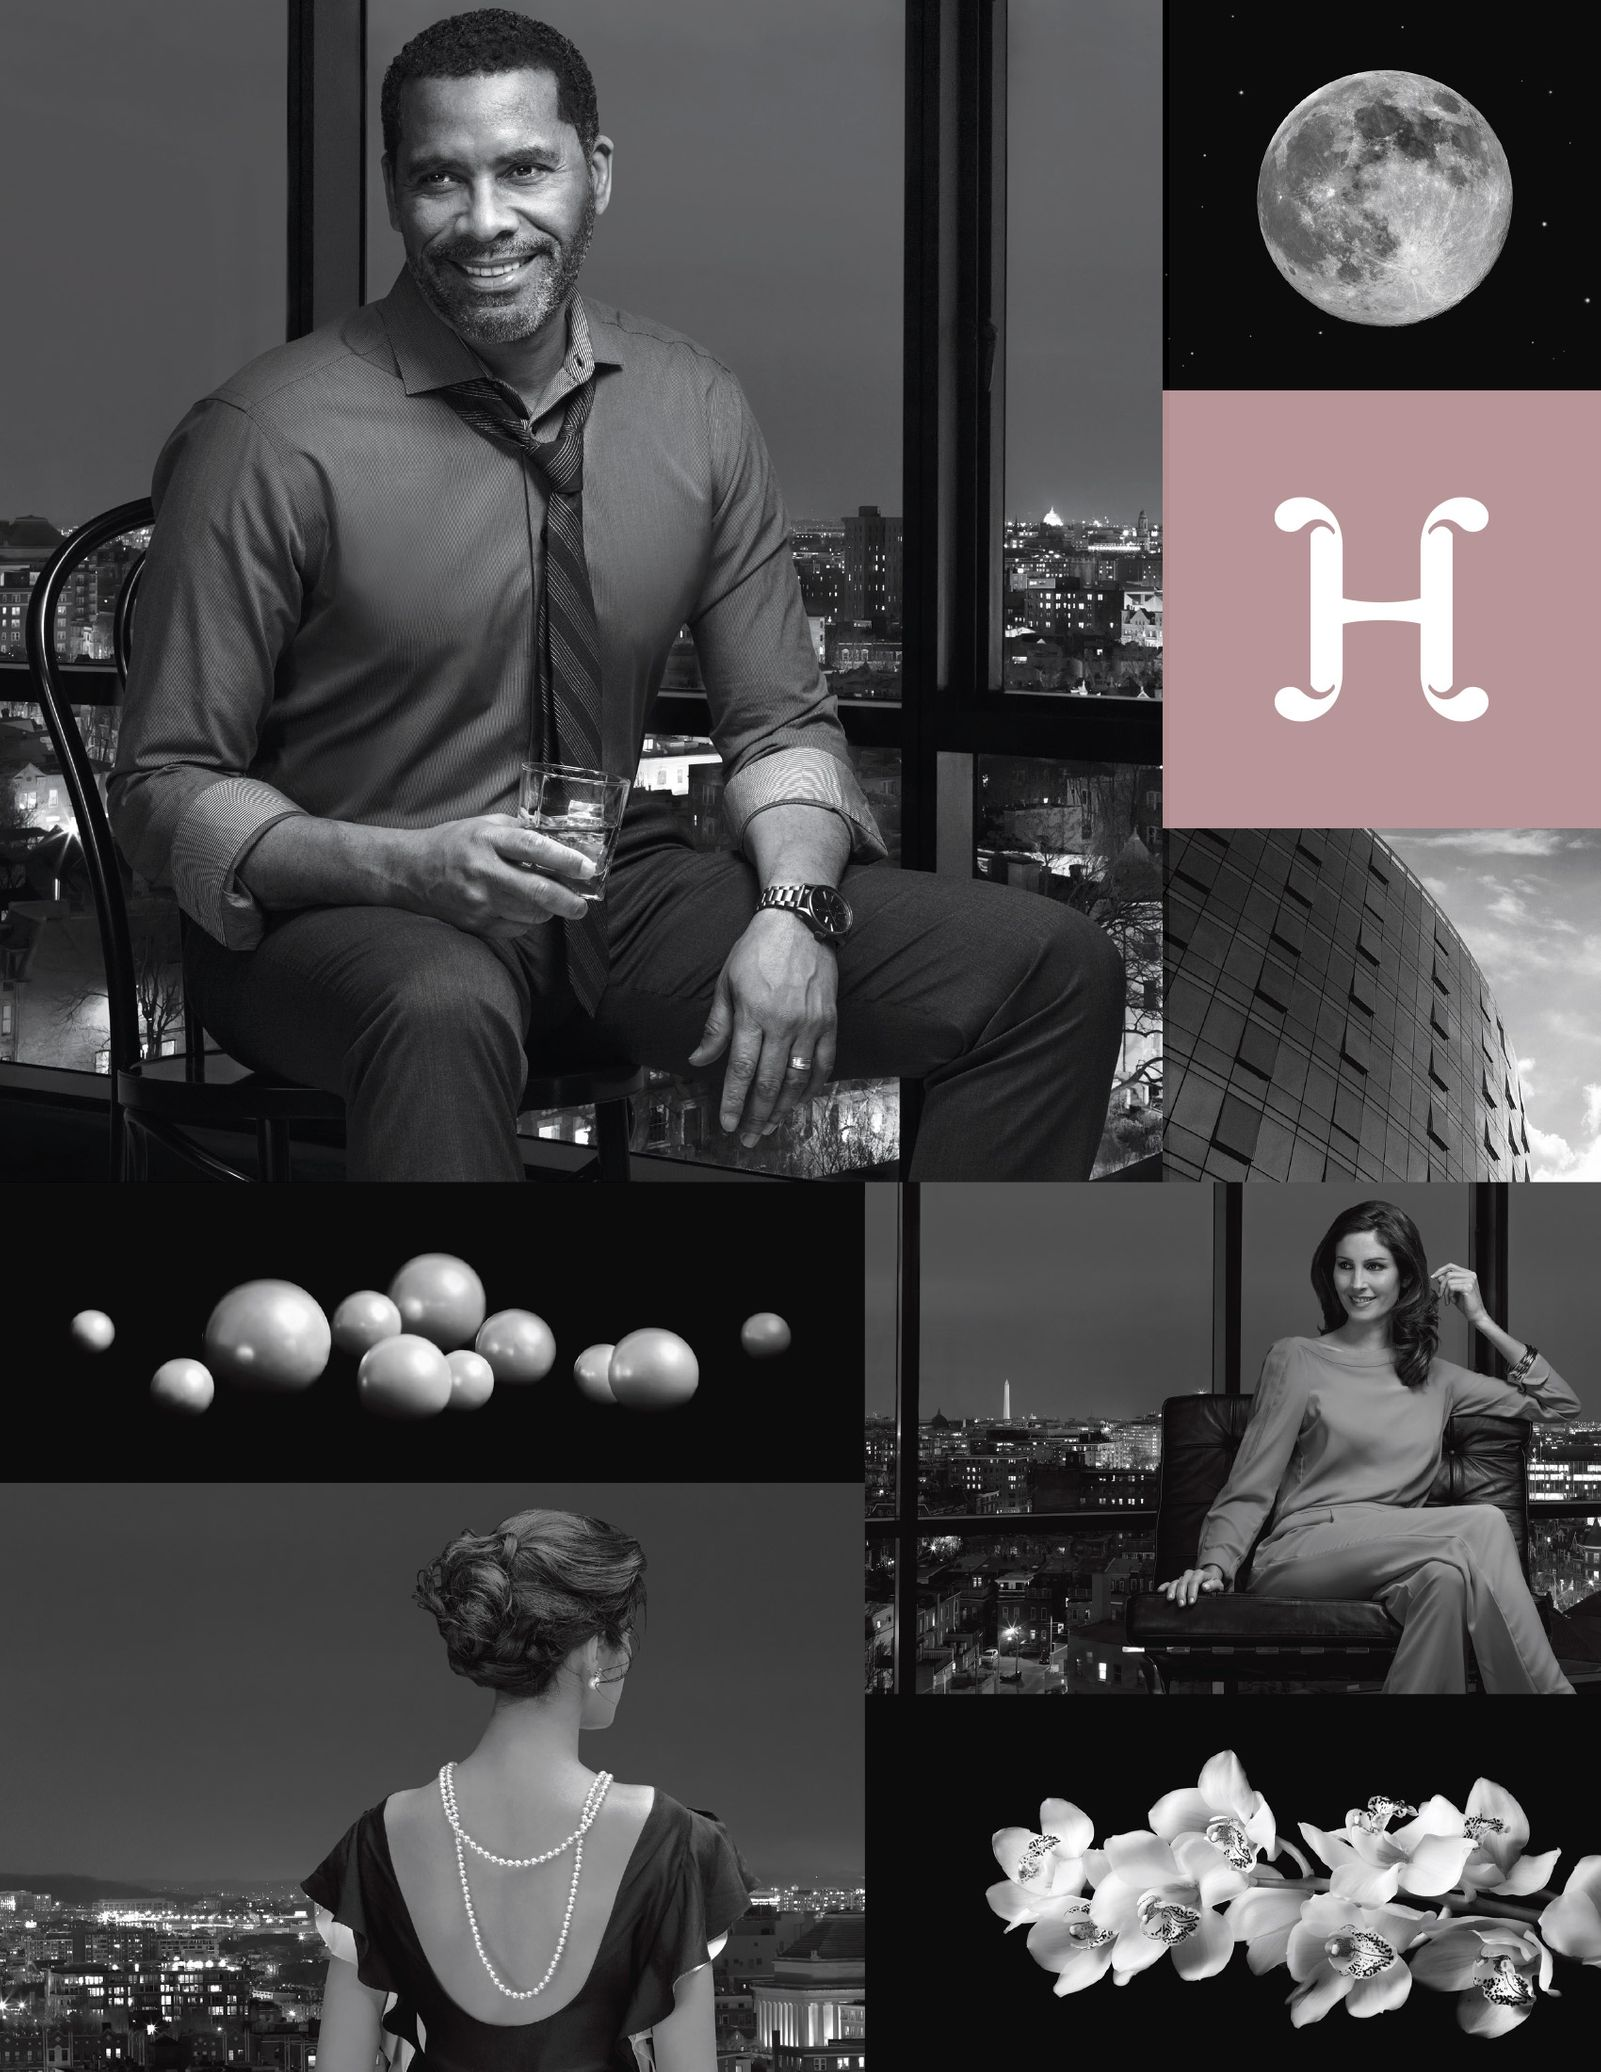 The-Hepburn-Mosiac_lb.jpg